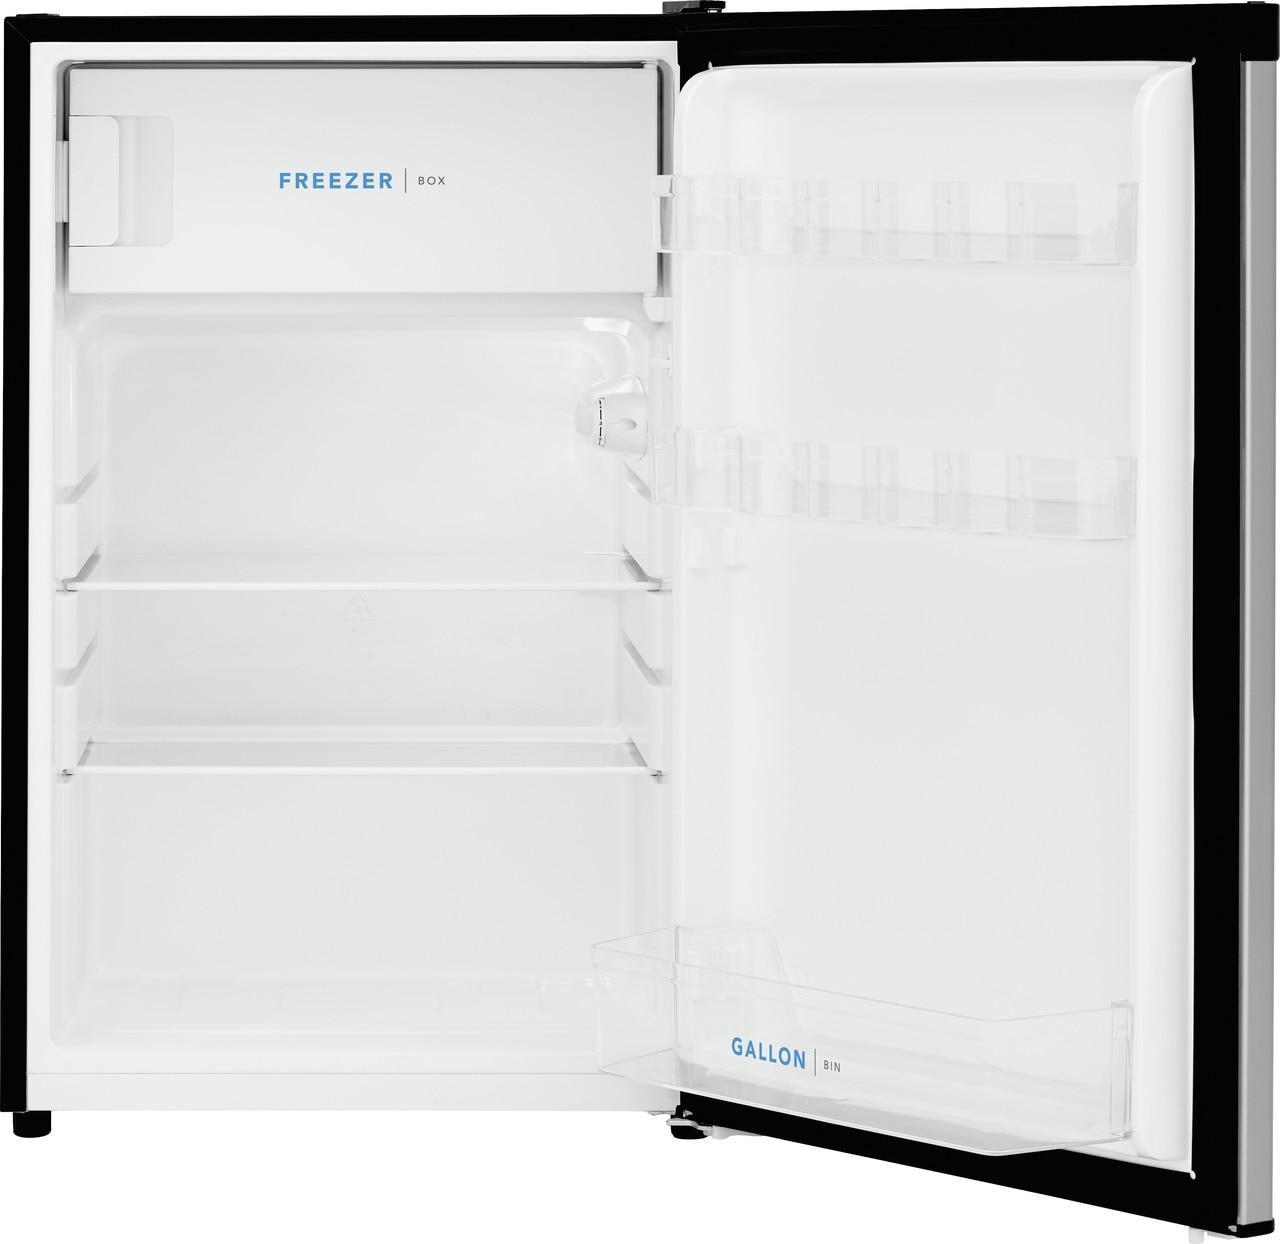 4.5 Cu. Ft. Compact Refrigerator Photo #2